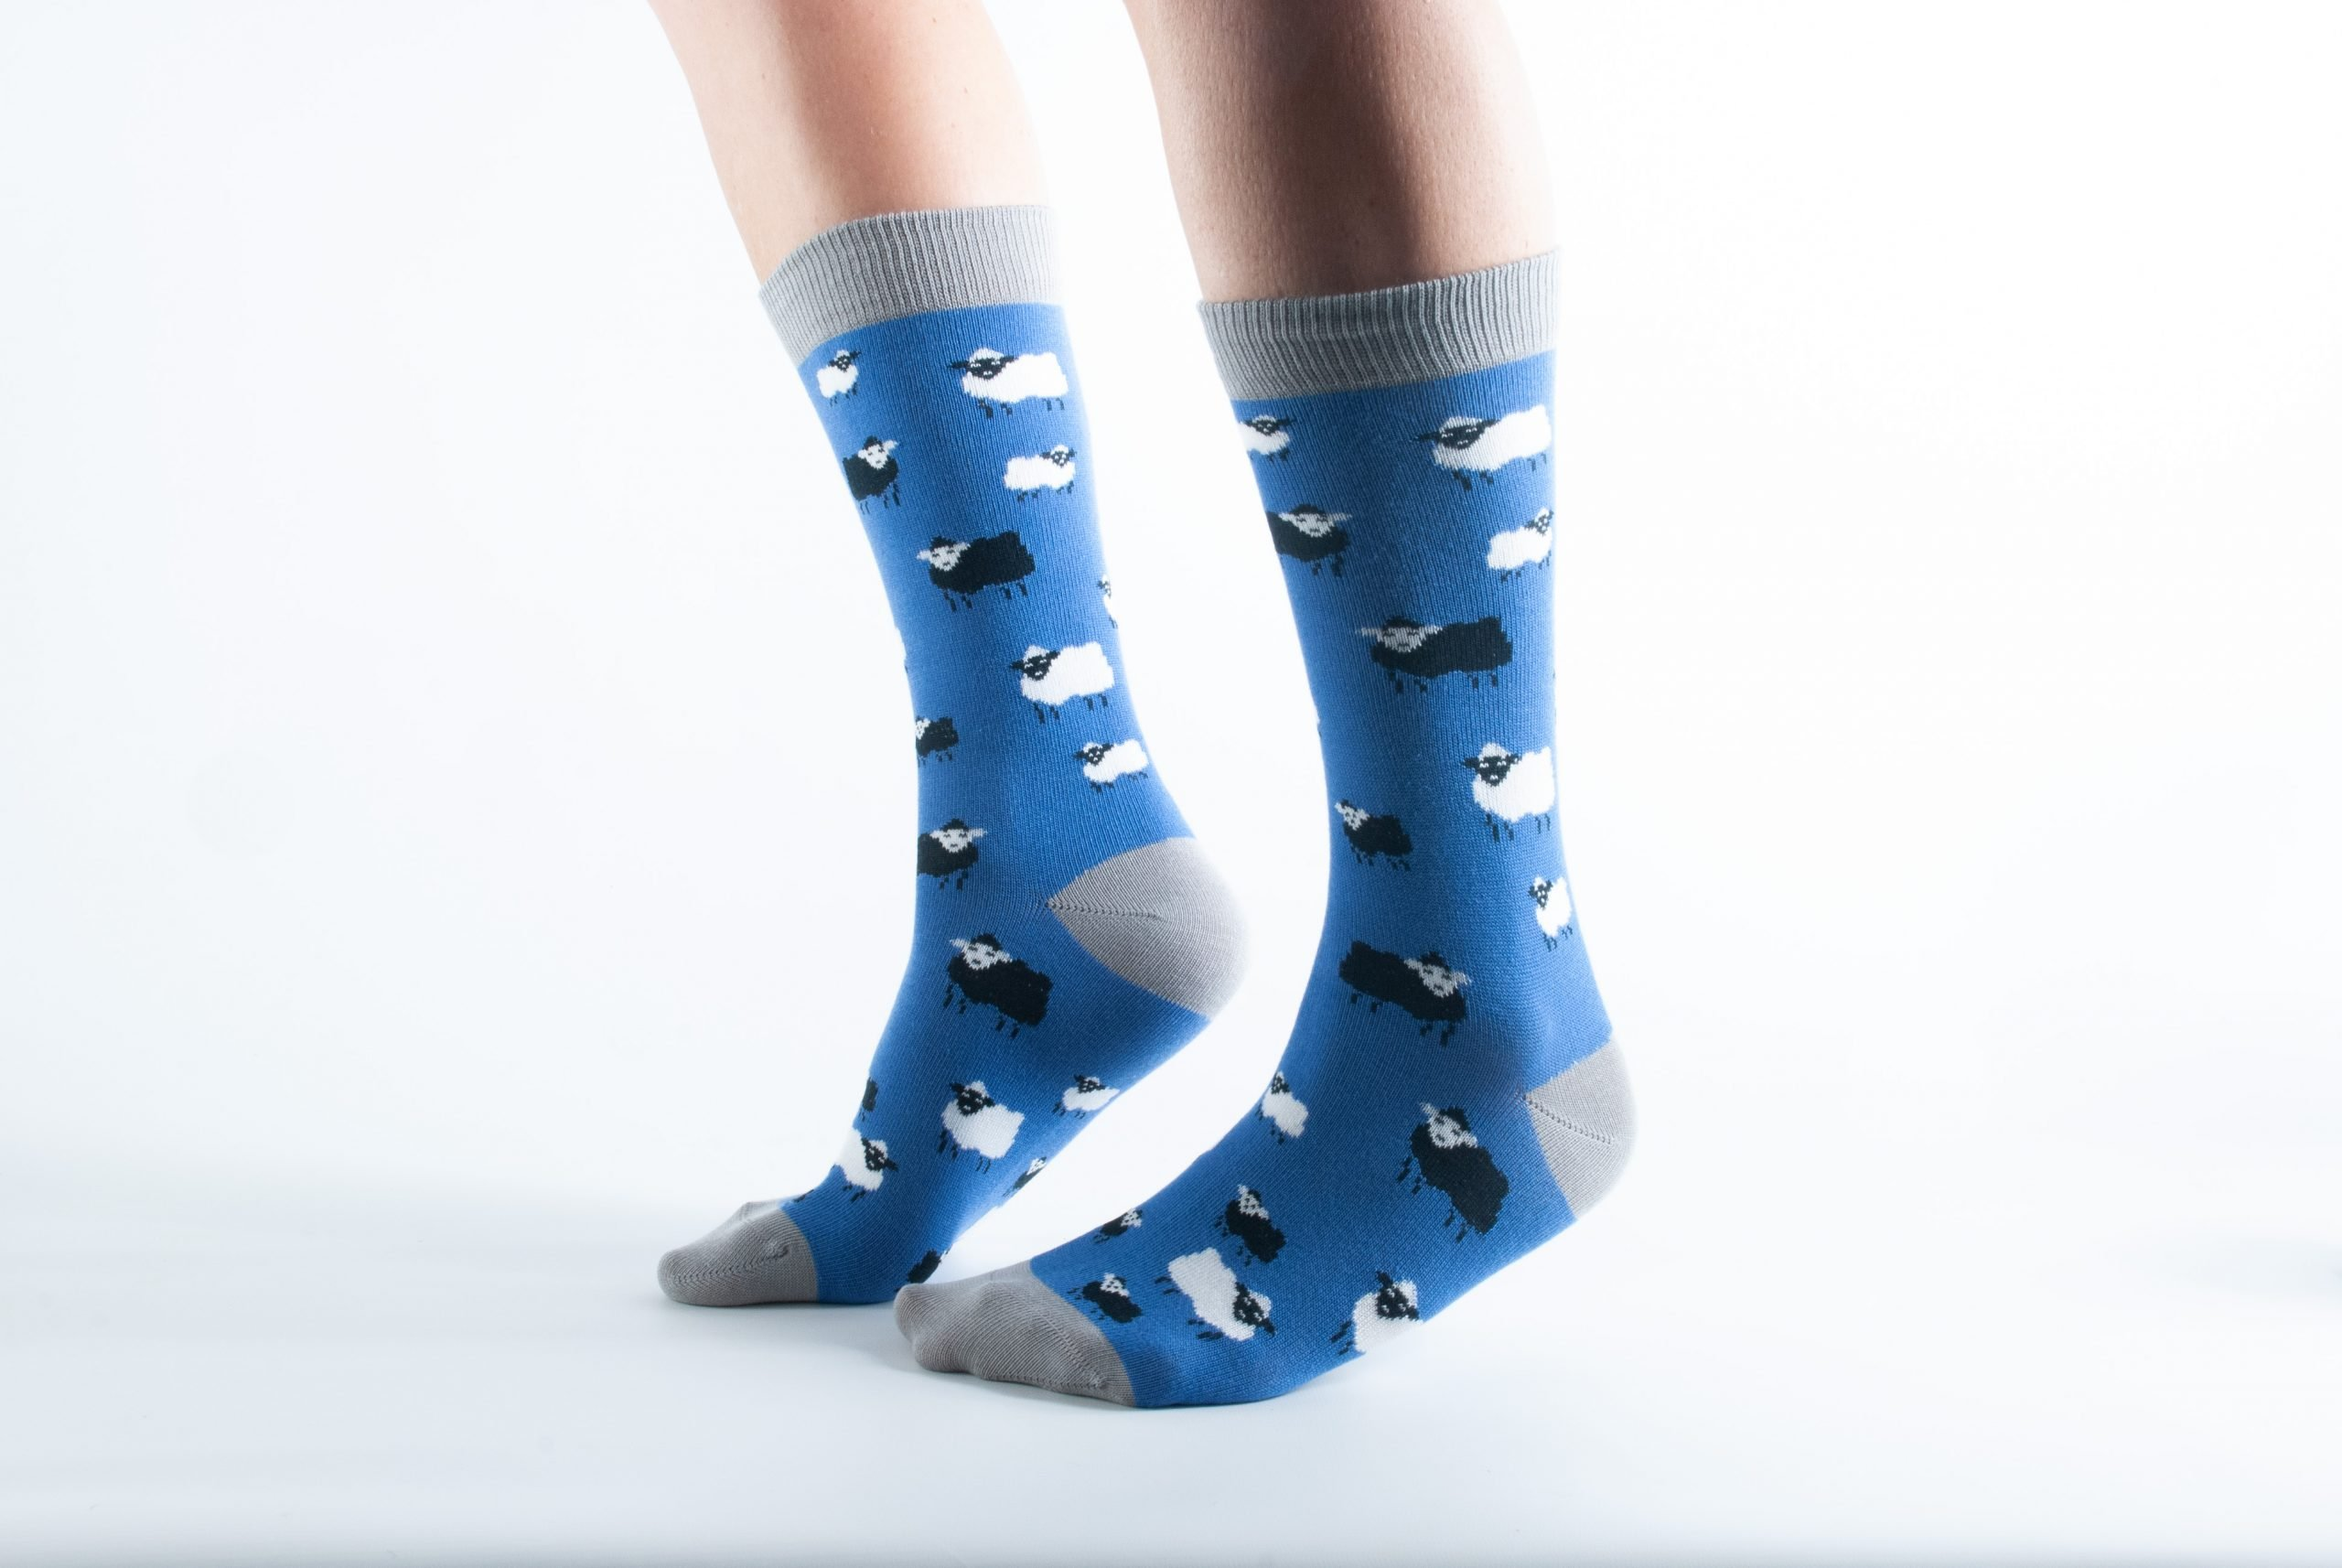 Womens Sheep bamboo socks - blue and grey